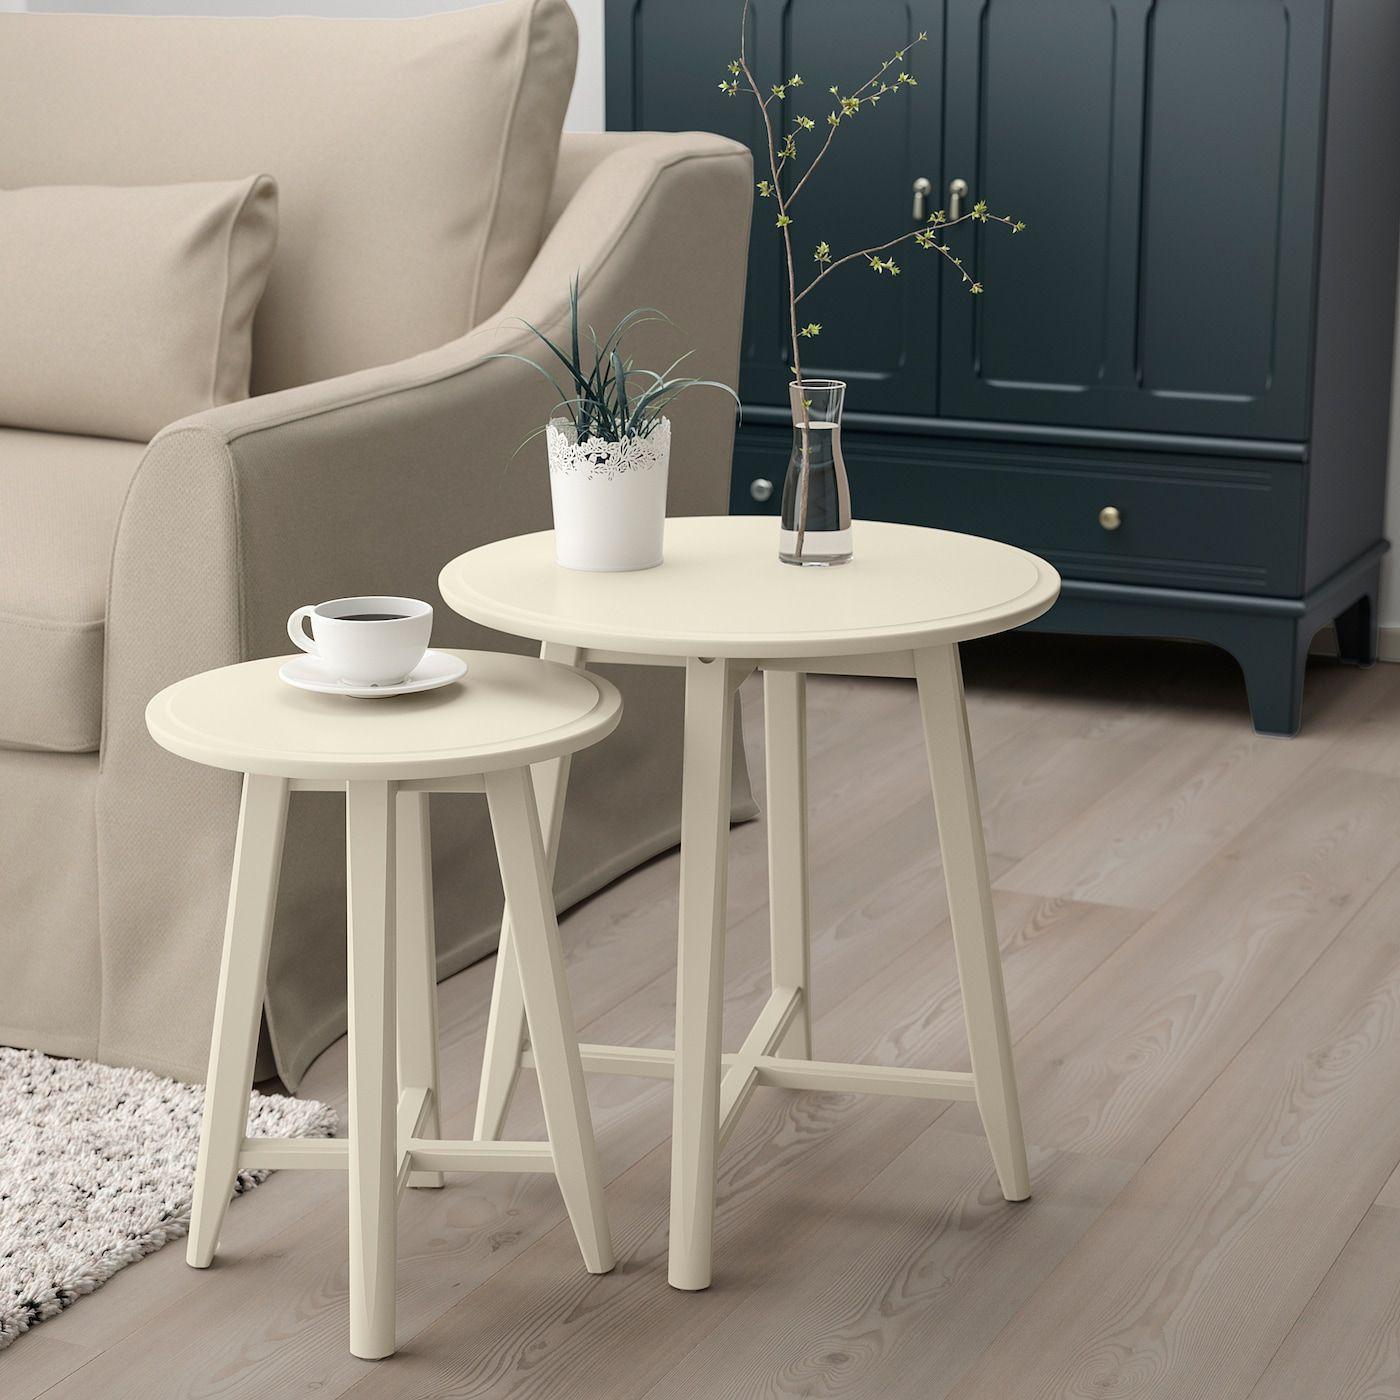 IKEA KRAGSTA Light Beige Nesting tables, set of 2 in 2020